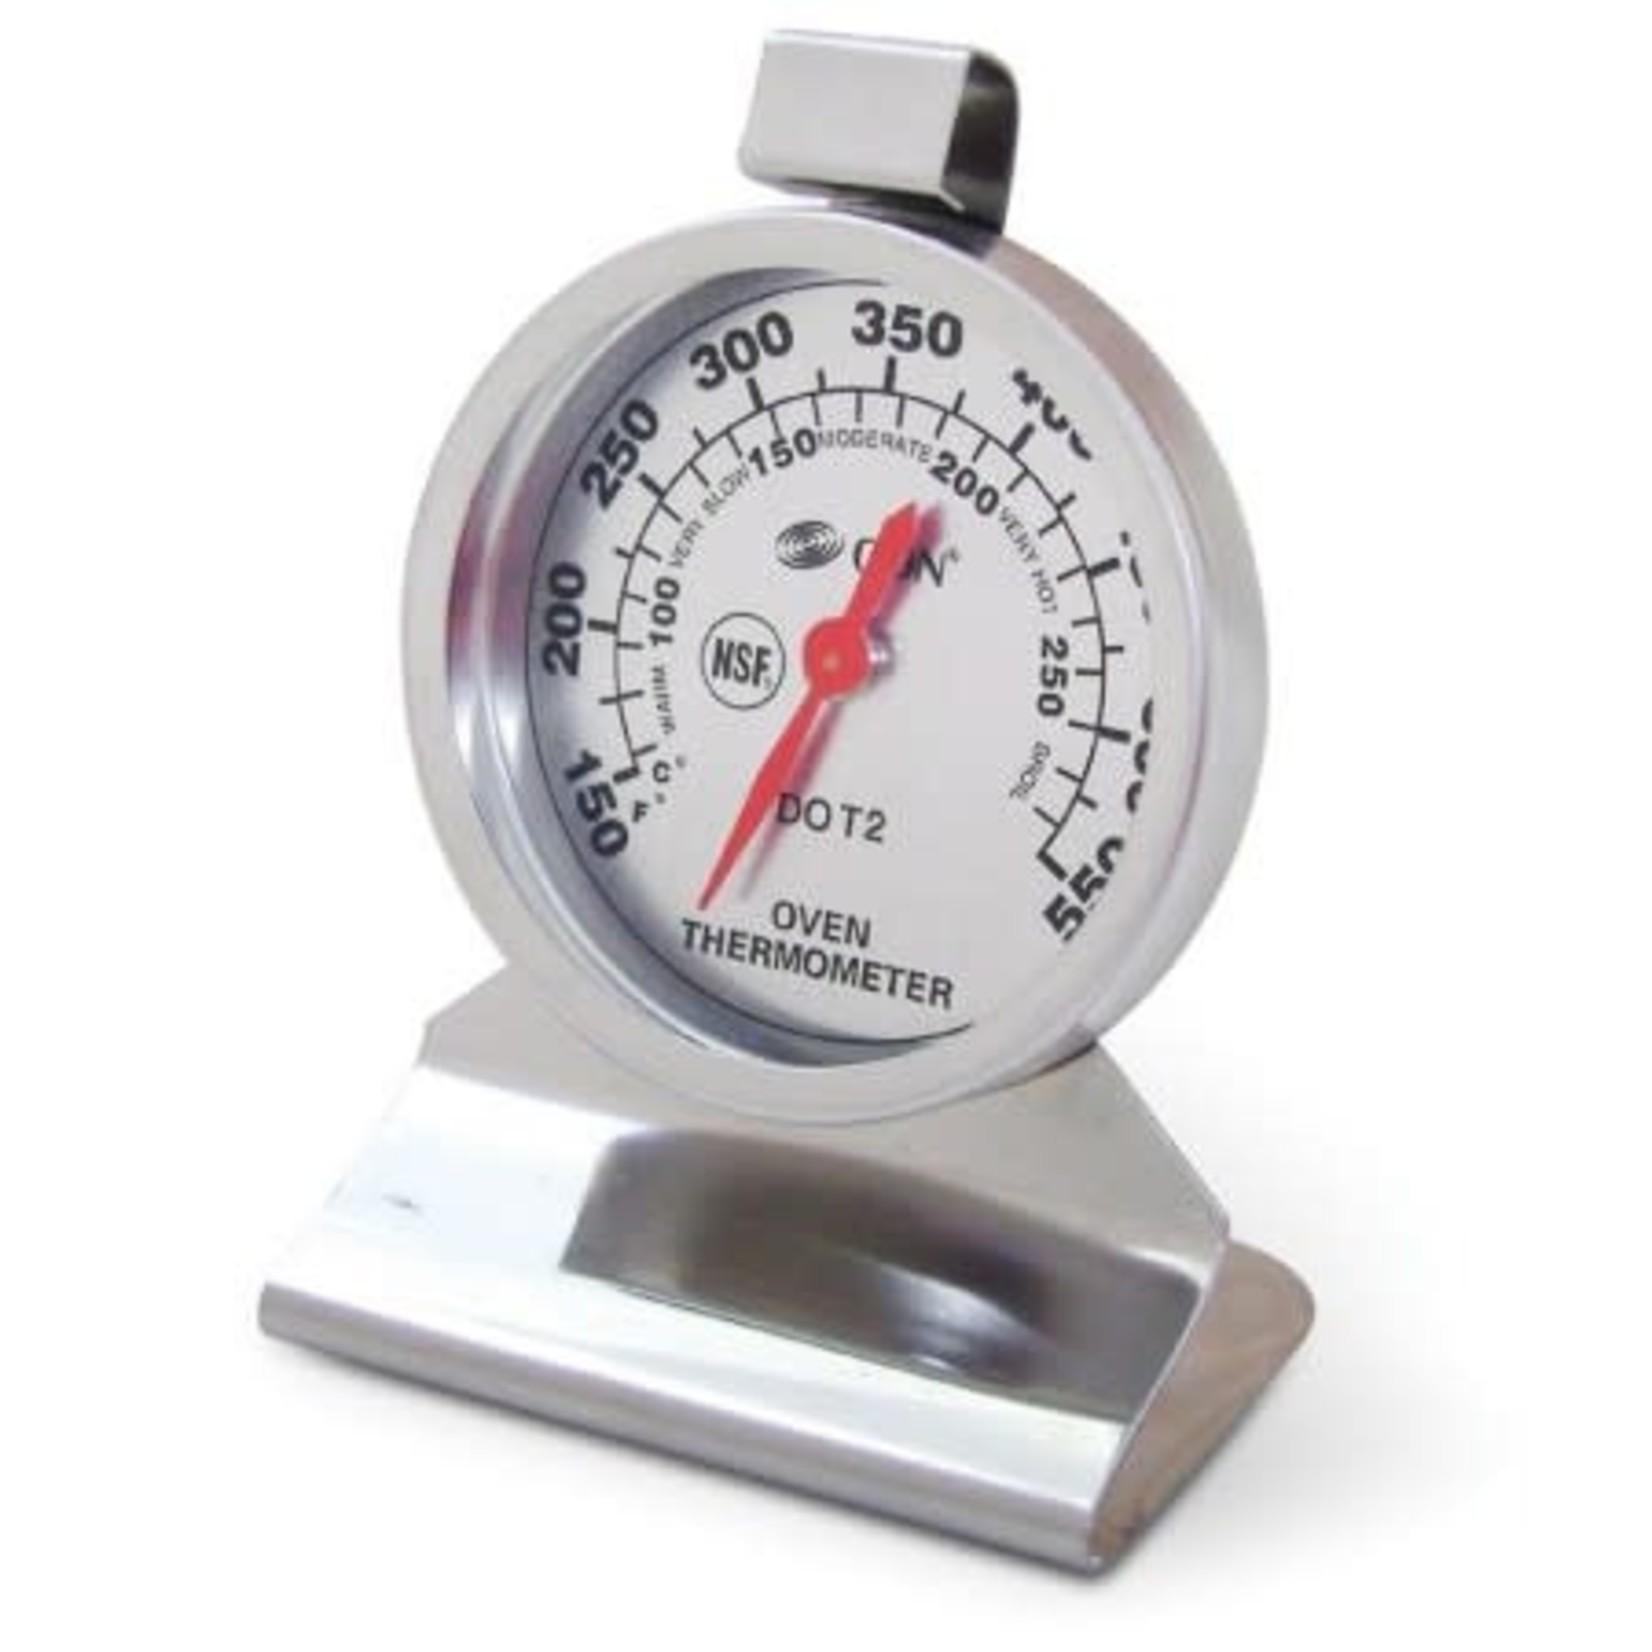 CDN Oventhermometer